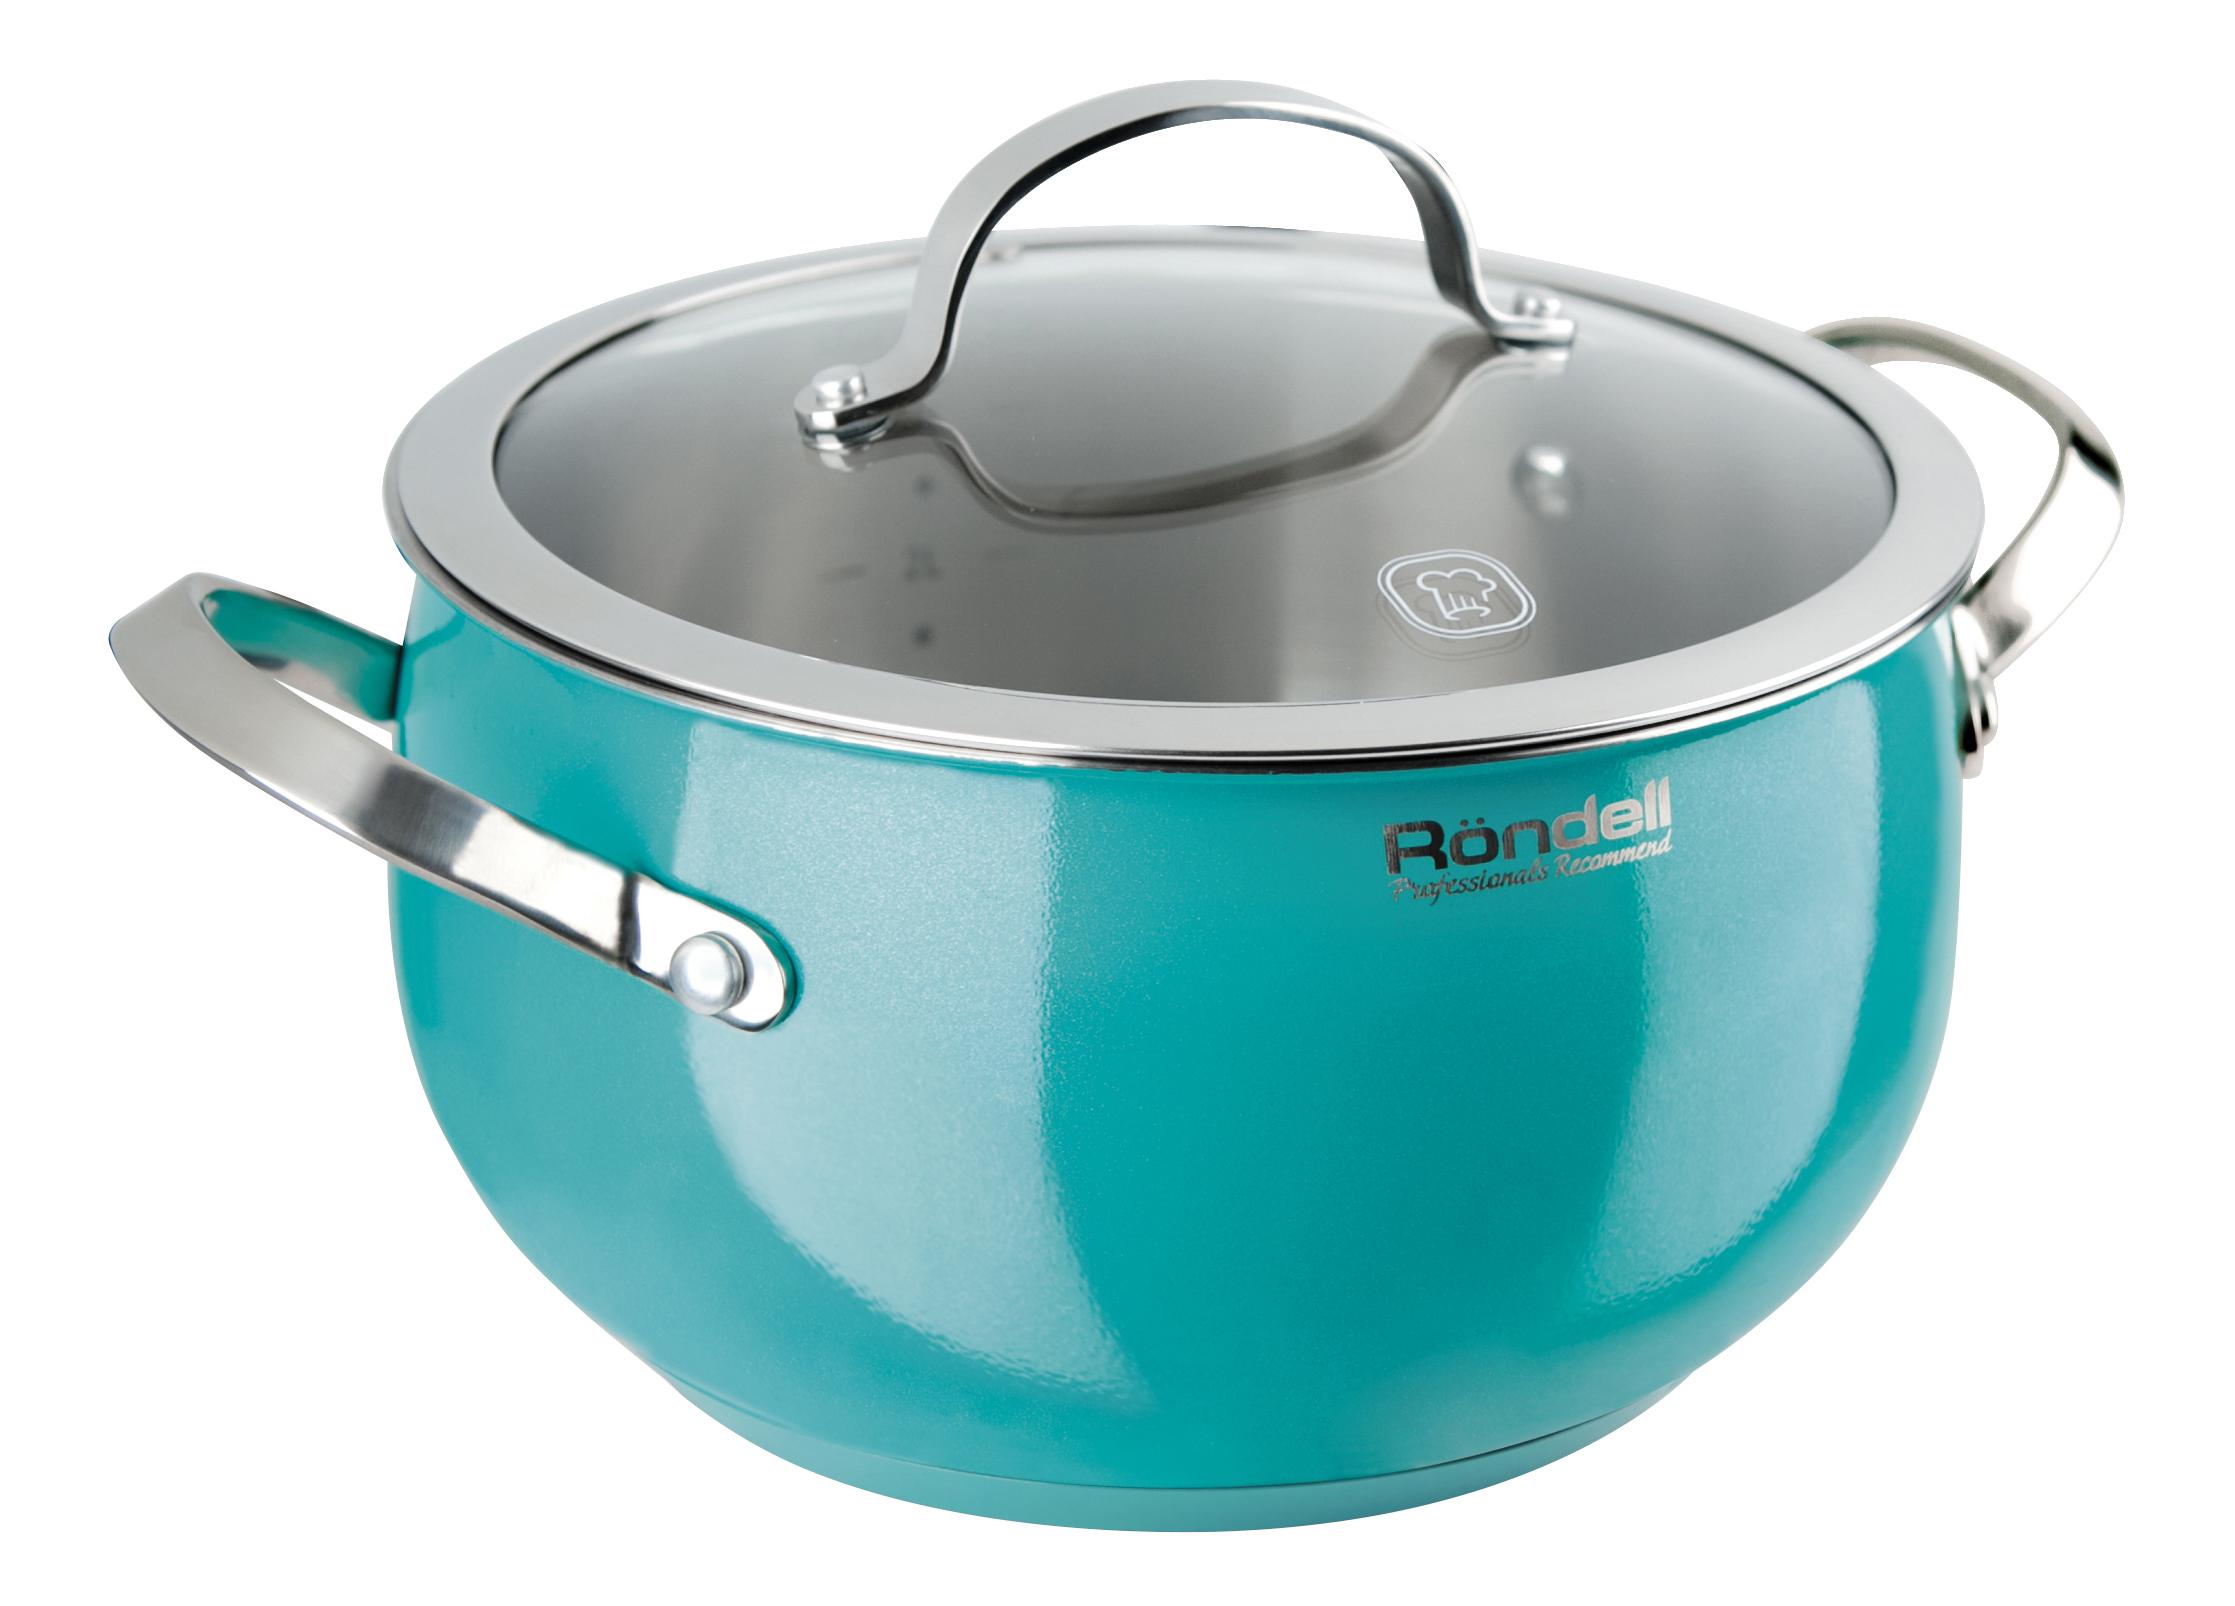 Кастрюля Röndell turquoise 5.8л фото